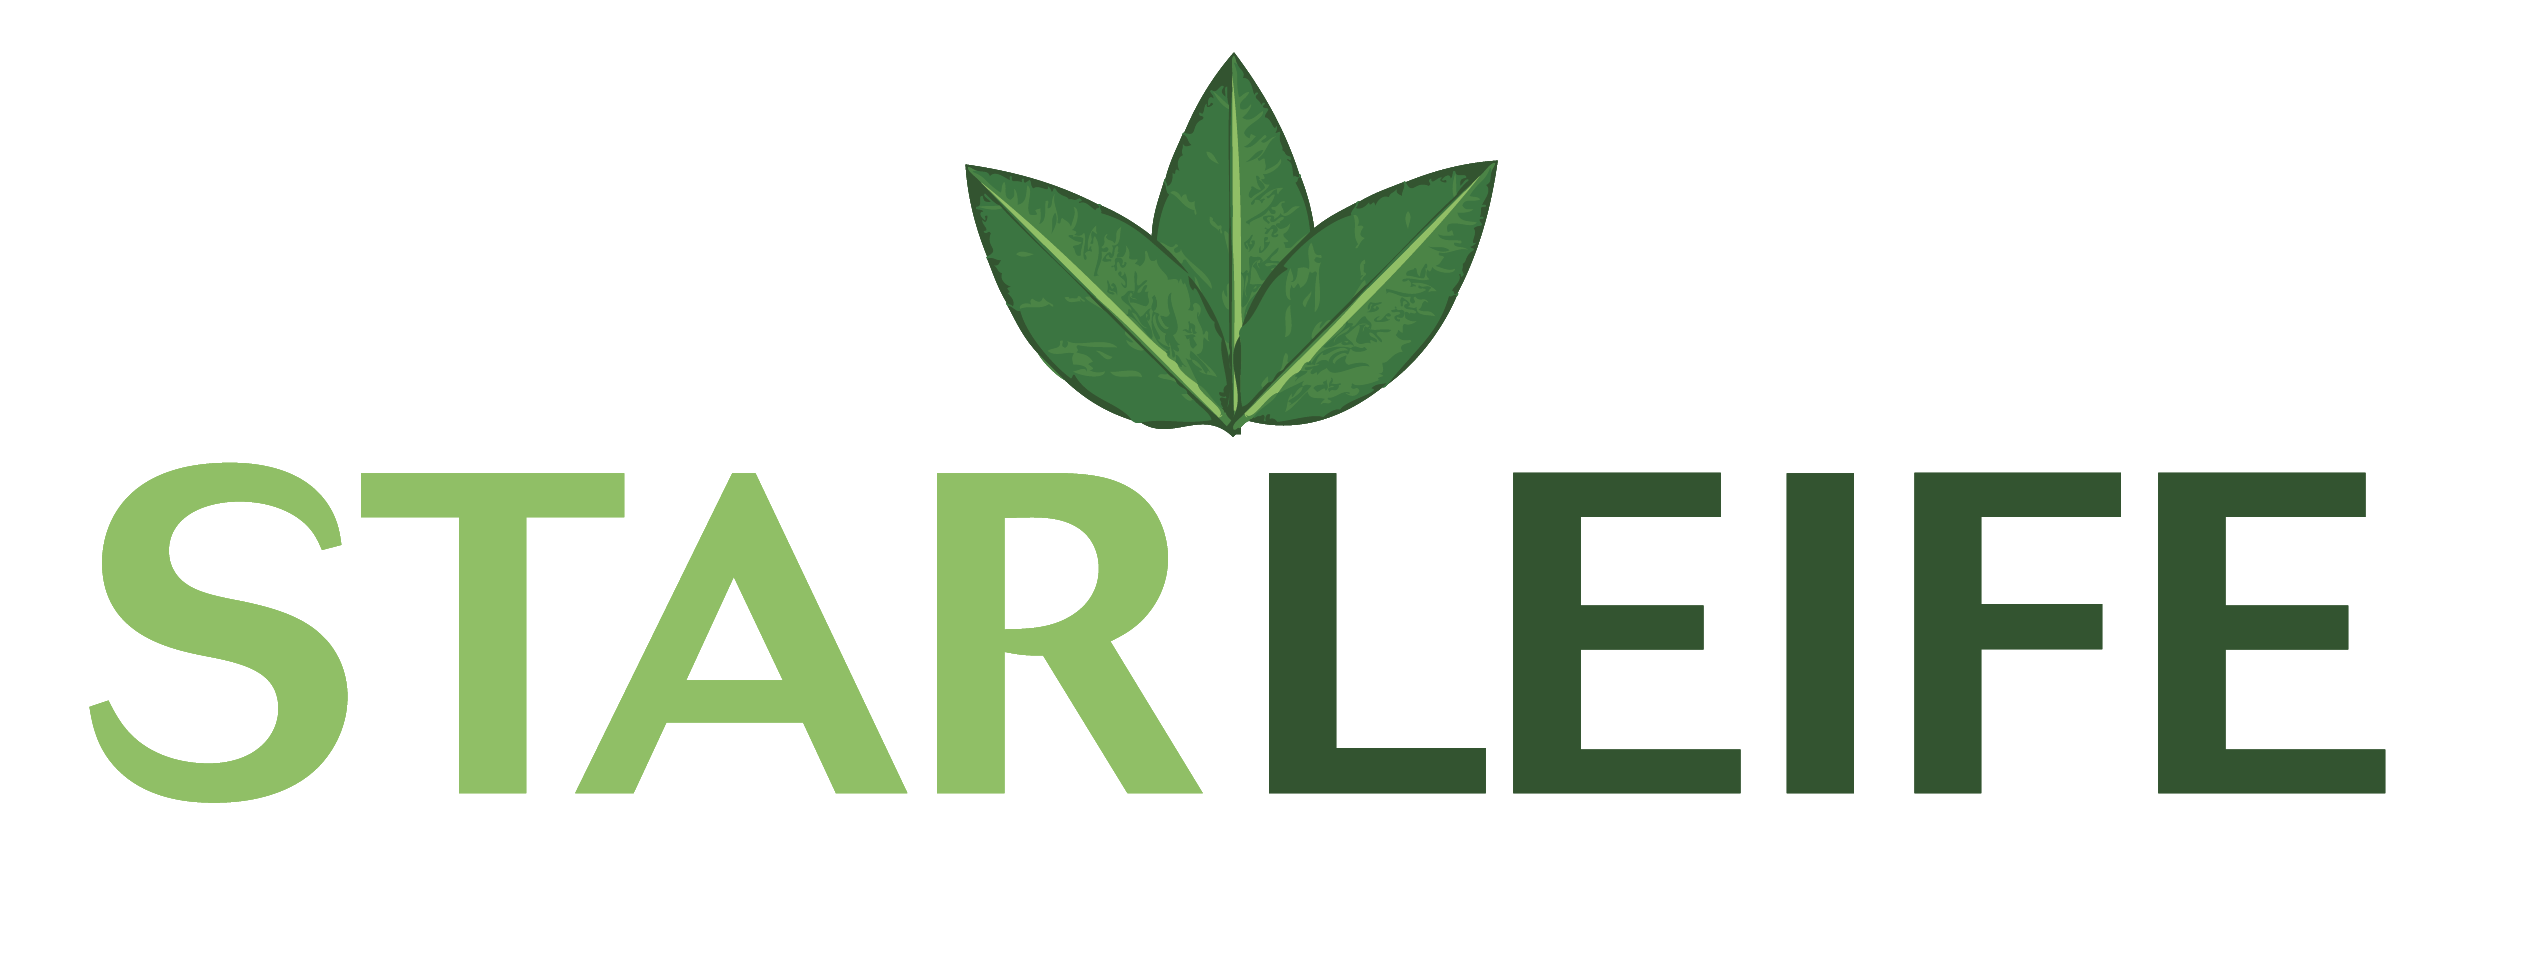 StarLeife Concept